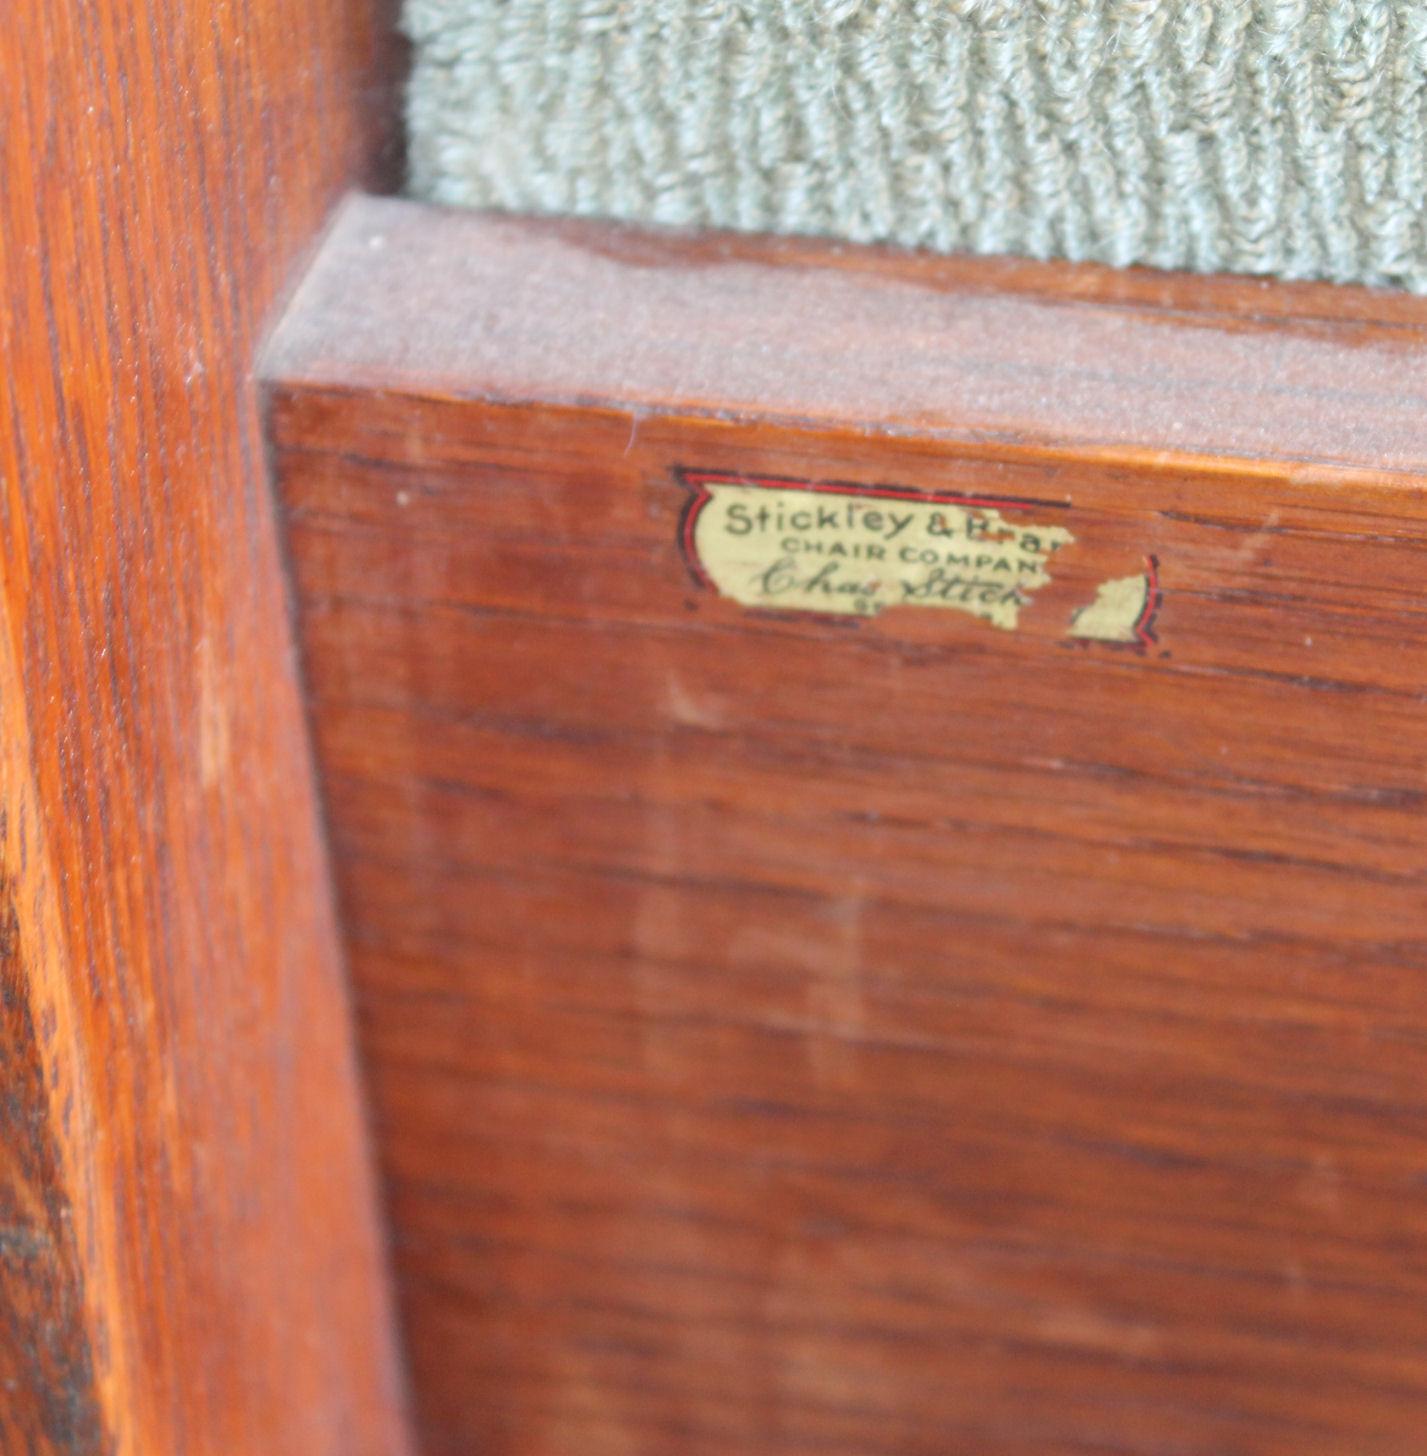 chair steel legs deals on high chairs bargain john's antiques | massive mission oak drop arm settle - charles stickley john ...